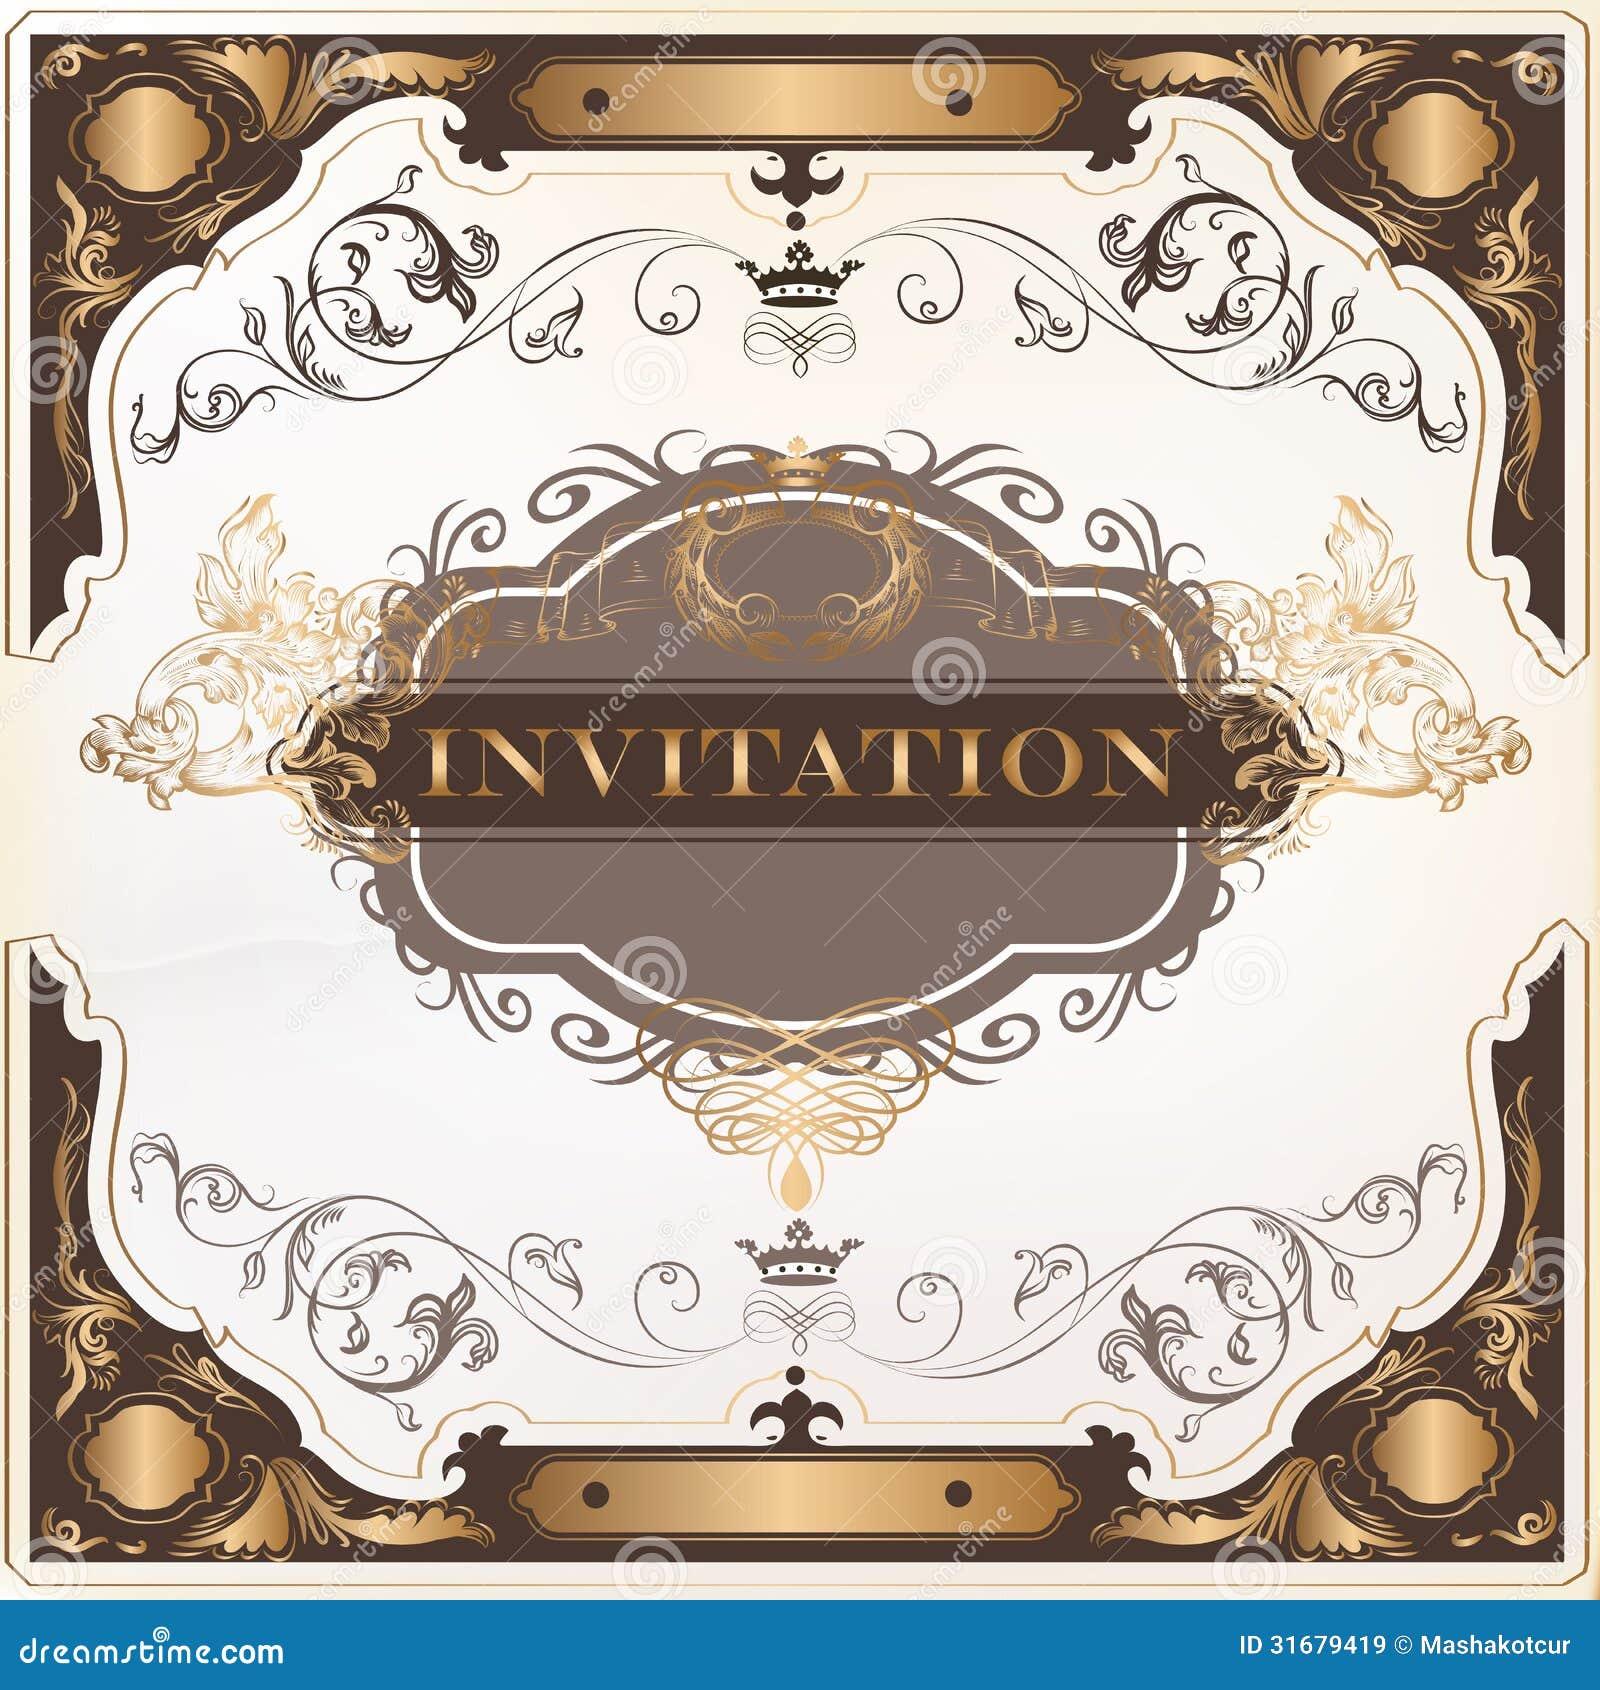 Royalty Free Stock Images Elegant Invitation Vector Card Design Classic Wedding Menu Retro Image31679419 on Victorian Ornamental Border Brown